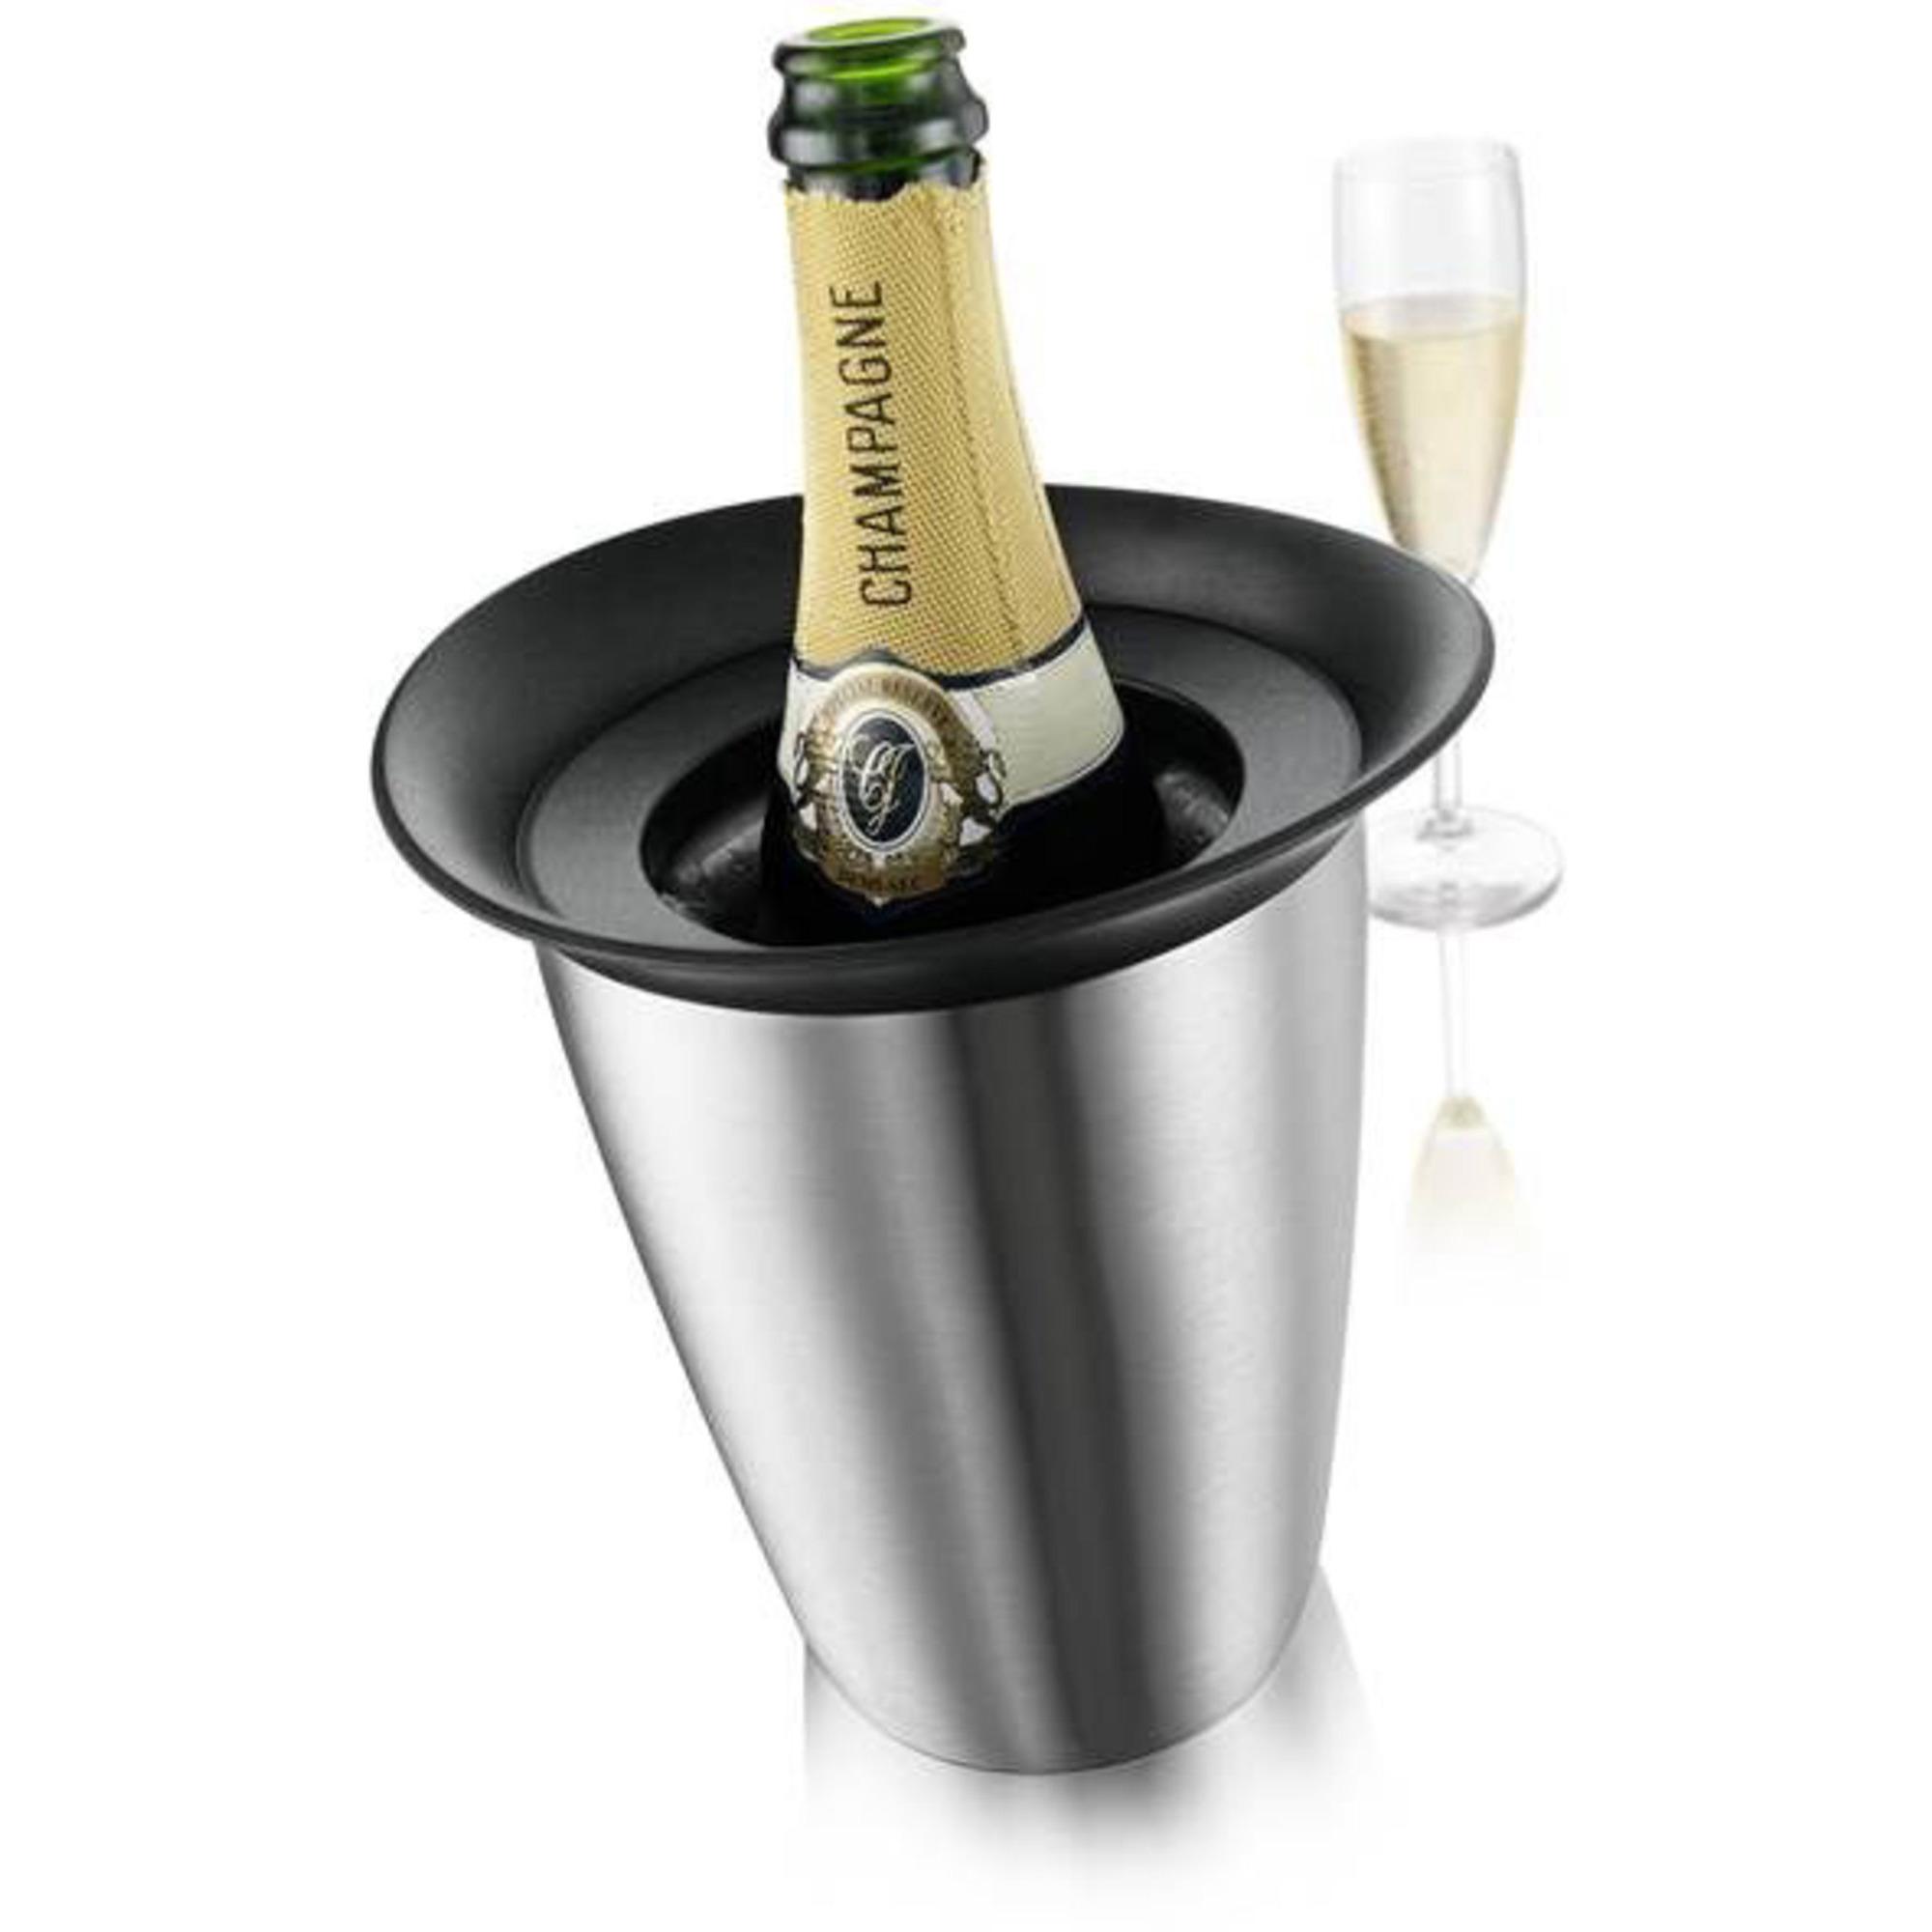 Vacu Vin Active Champagne Cooler Elegant Stai.S